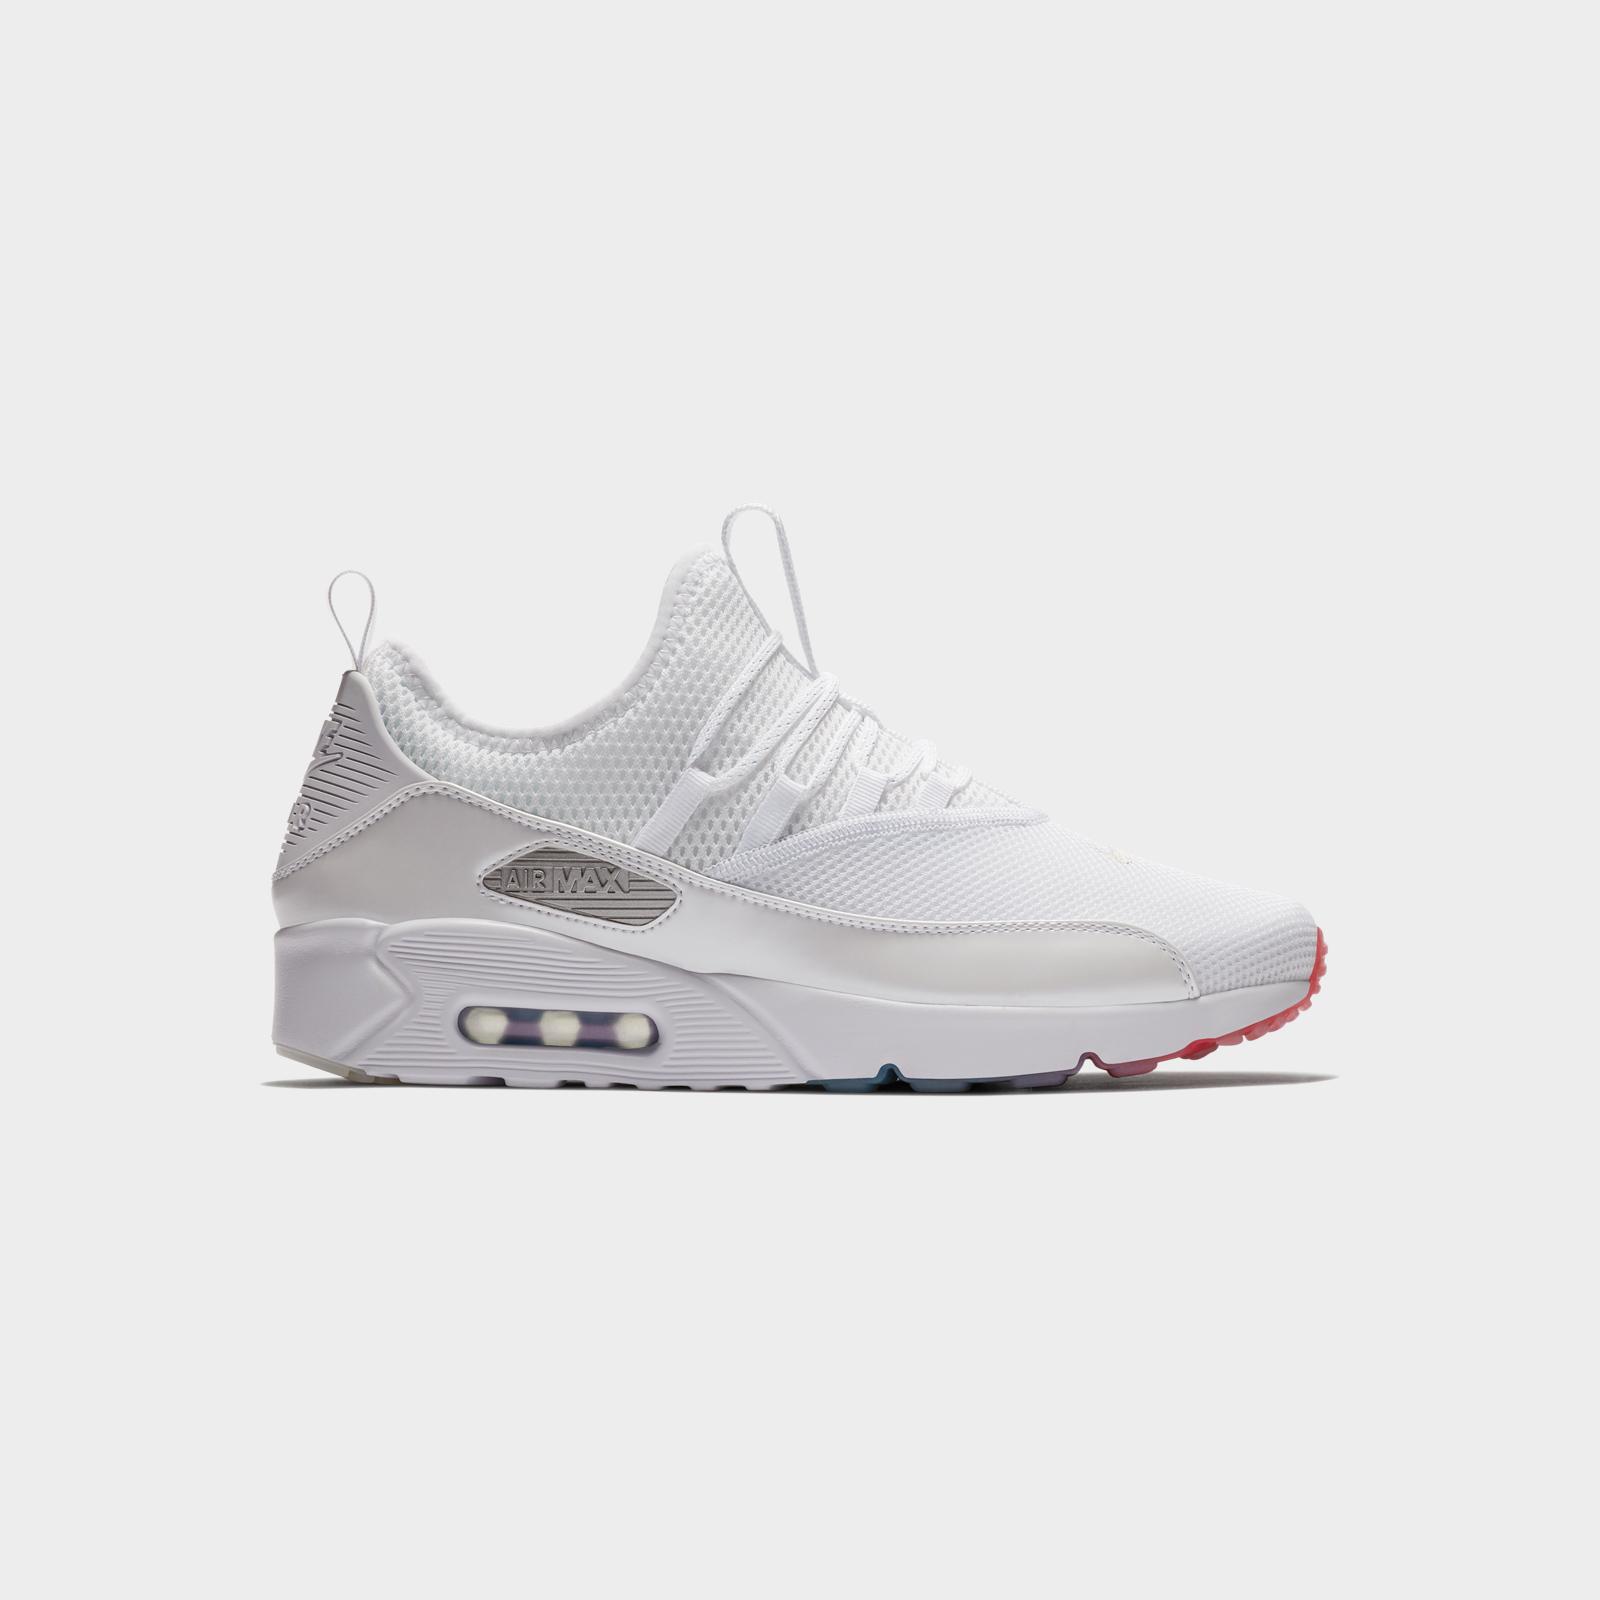 Nike Air Max 90 EZ - Aq7980-100 - Sneakersnstuff  19ab2014d